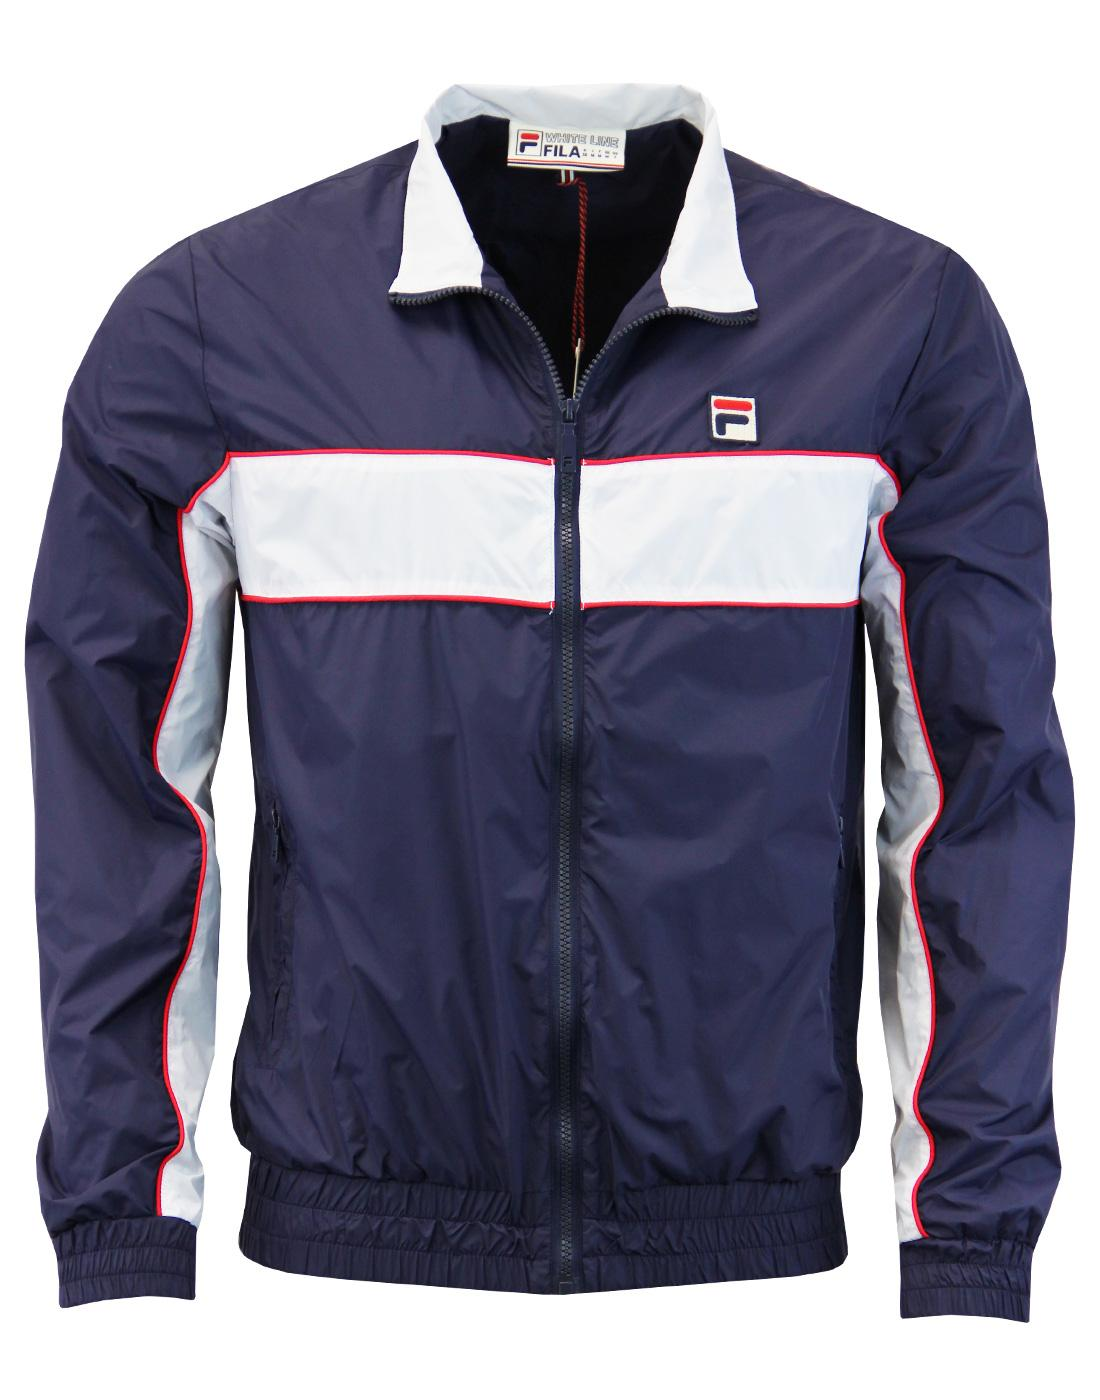 Amauri FILA VINTAGE Retro Indie 70s Sports Jacket